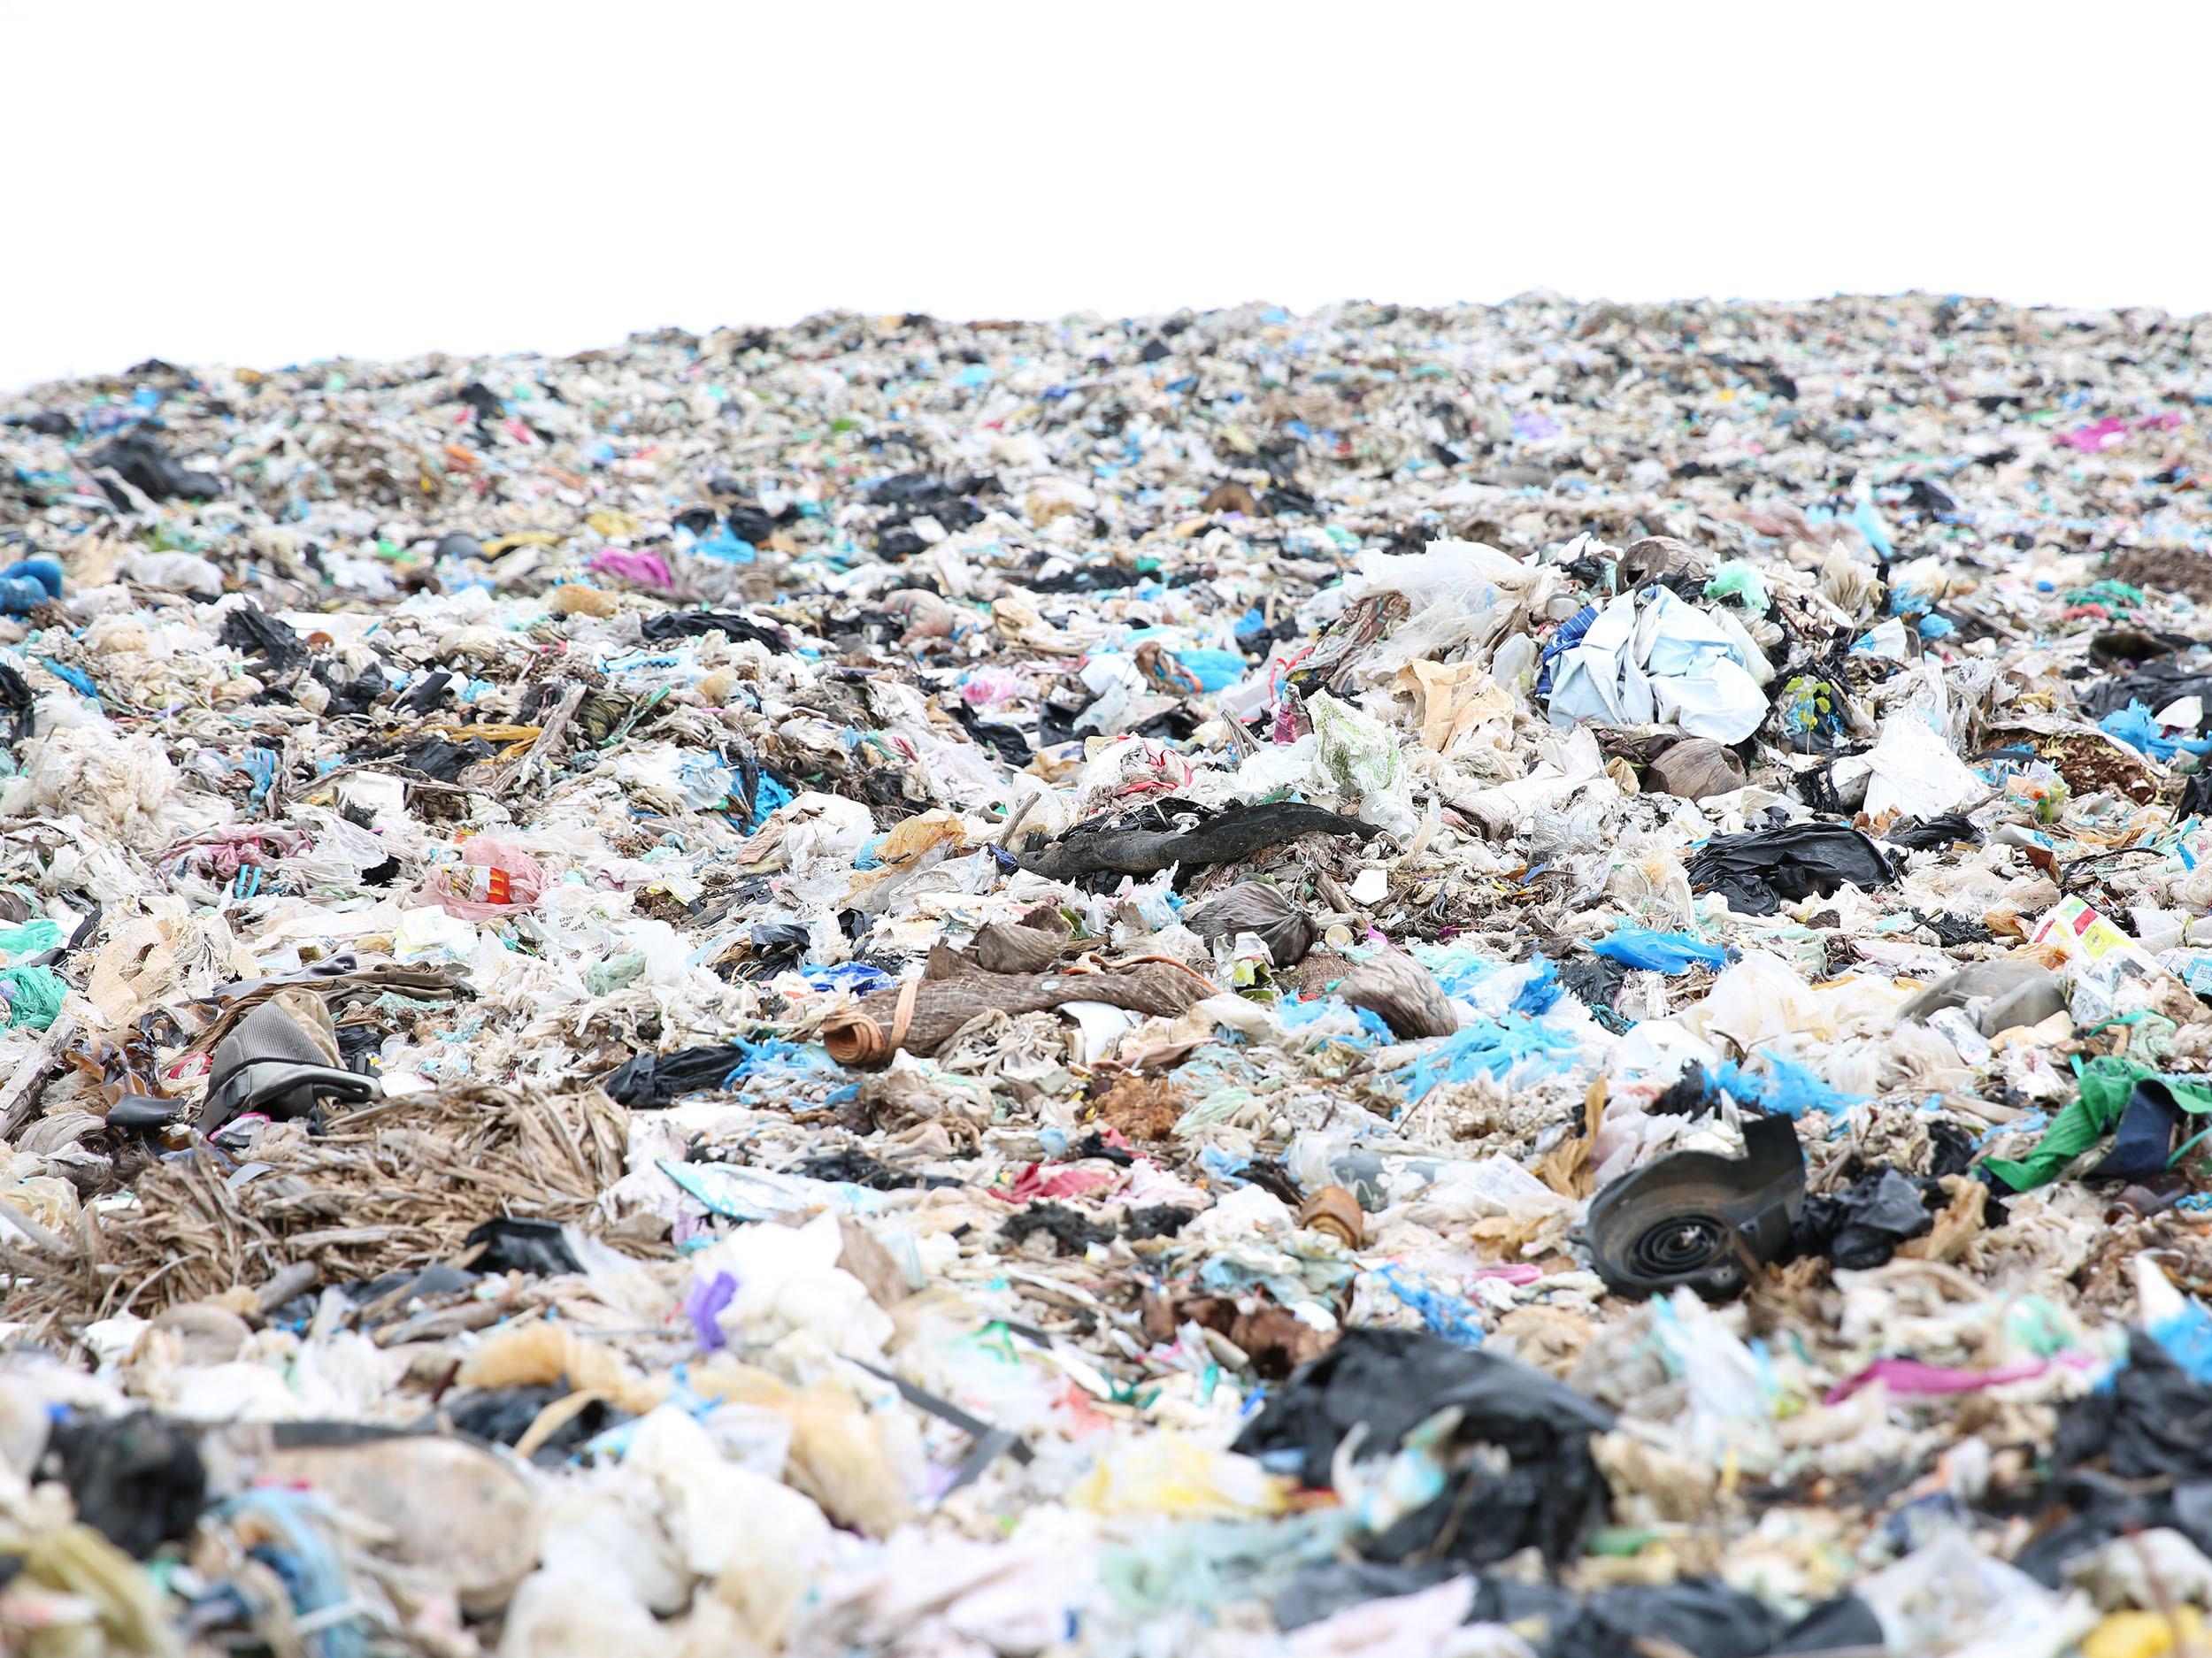 A landfill site in Siem Reap, Cambodia